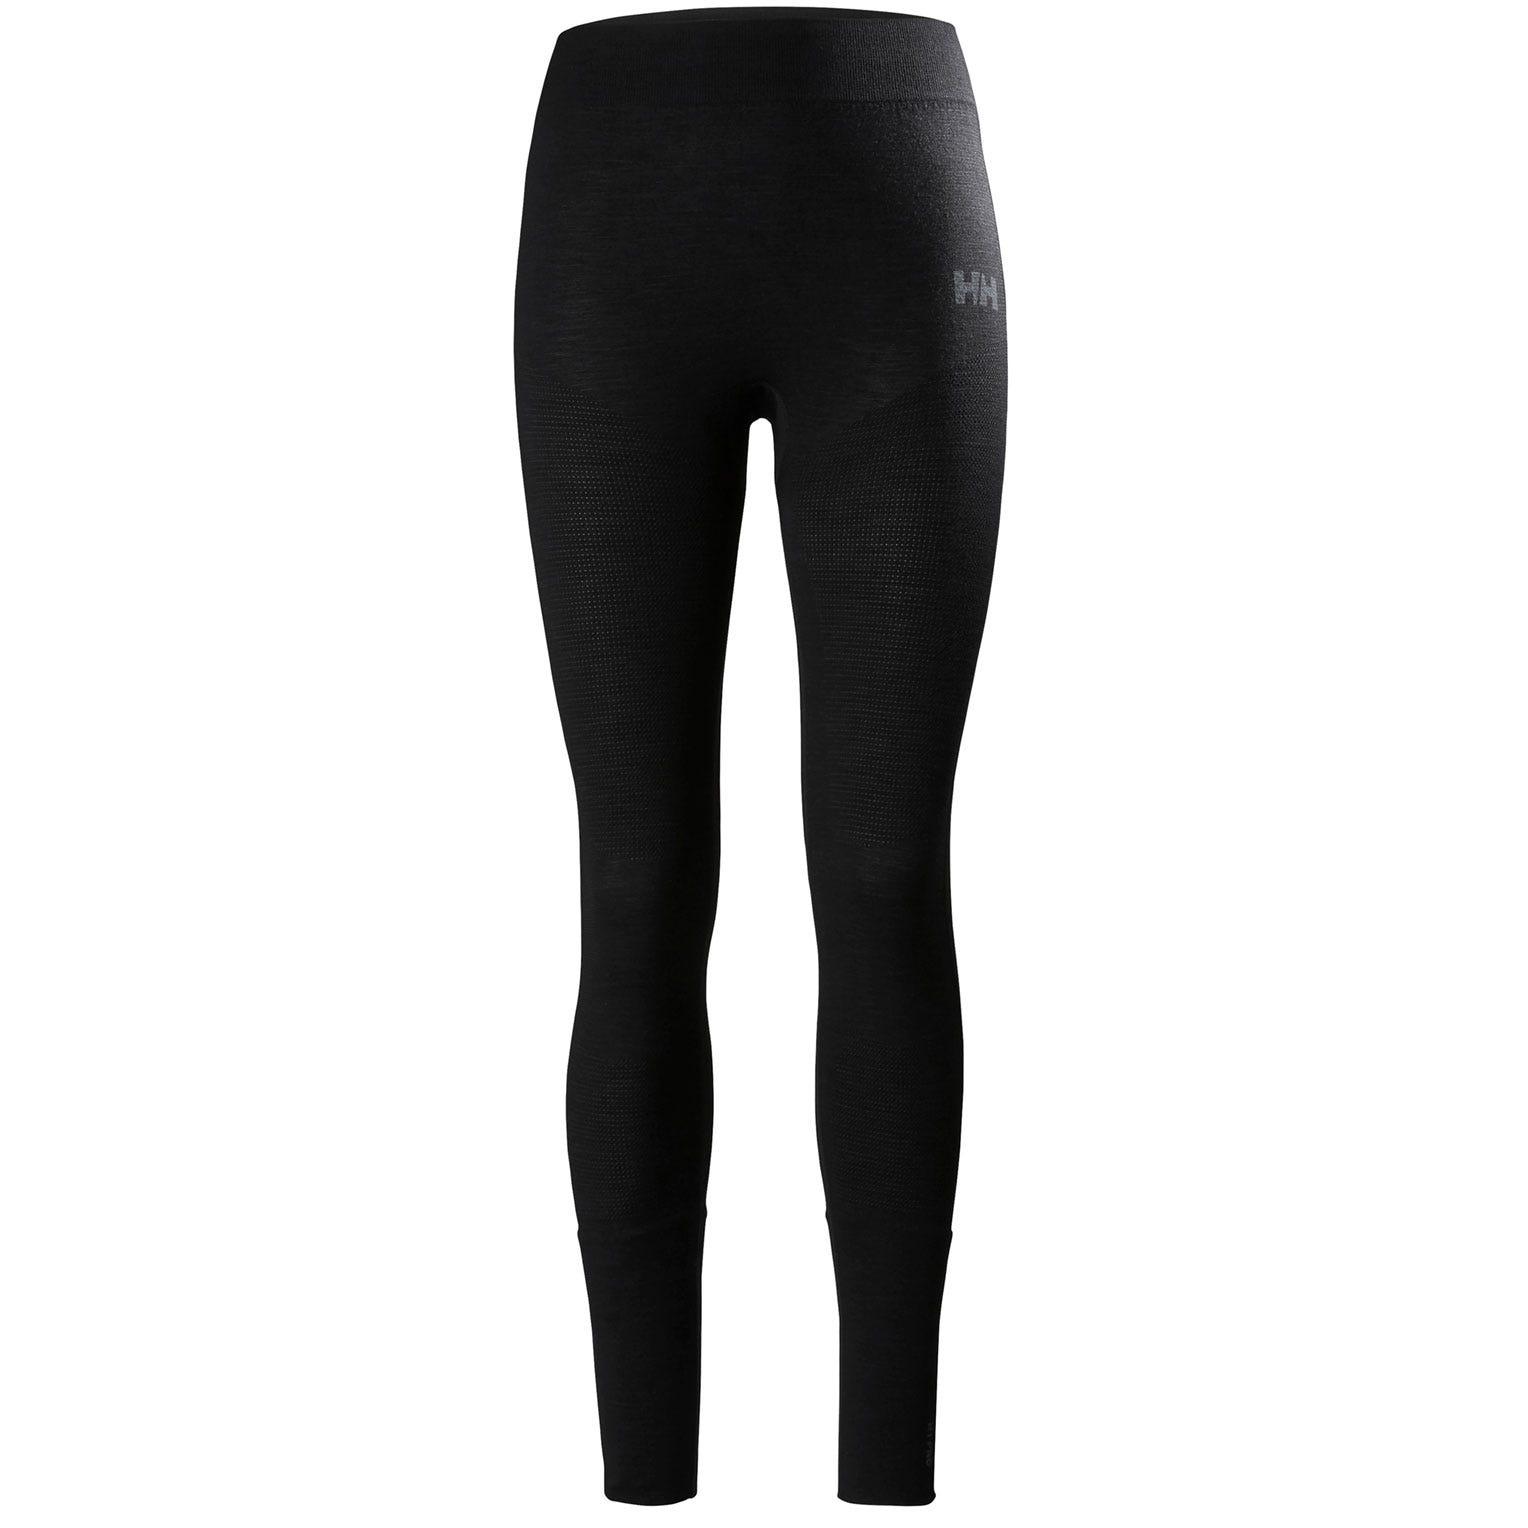 Helly Hansen Women's H1 Prolifa Seamless Base Layer Trousers Black M